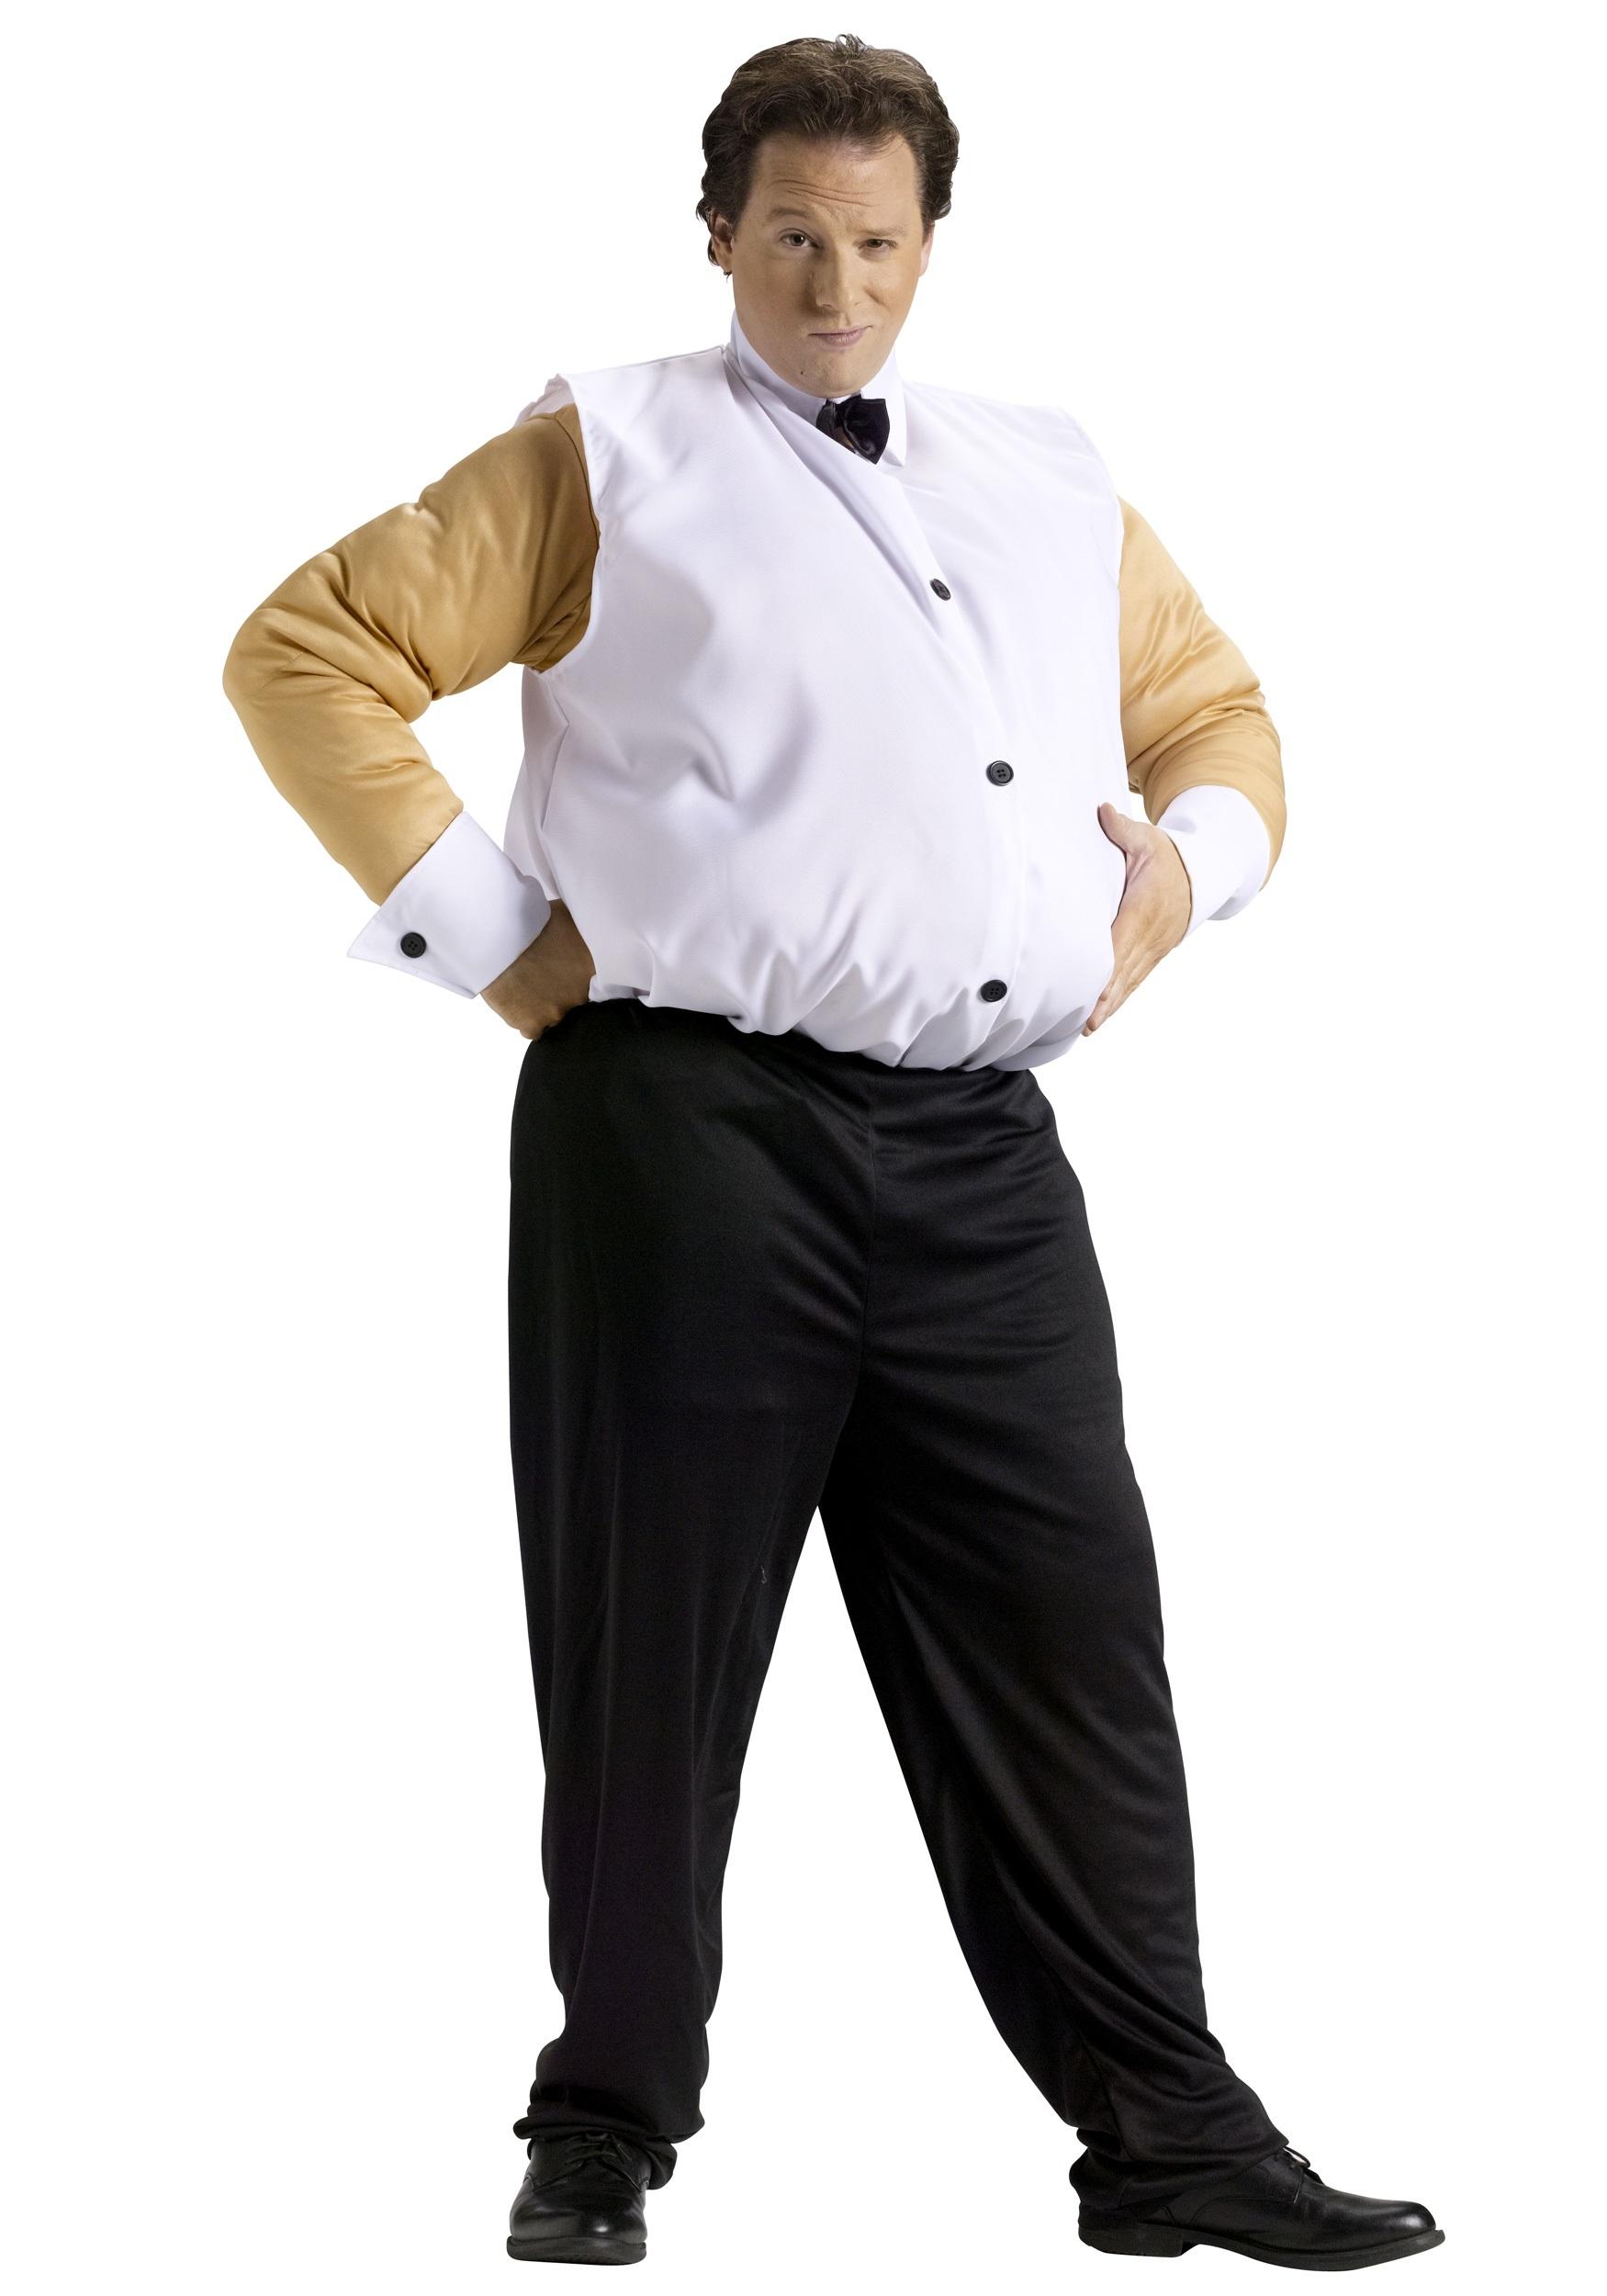 Mens Fat Stripper Costume  sc 1 st  Halloween Costumes & Mens Fat Stripper Costume - Halloween Costumes